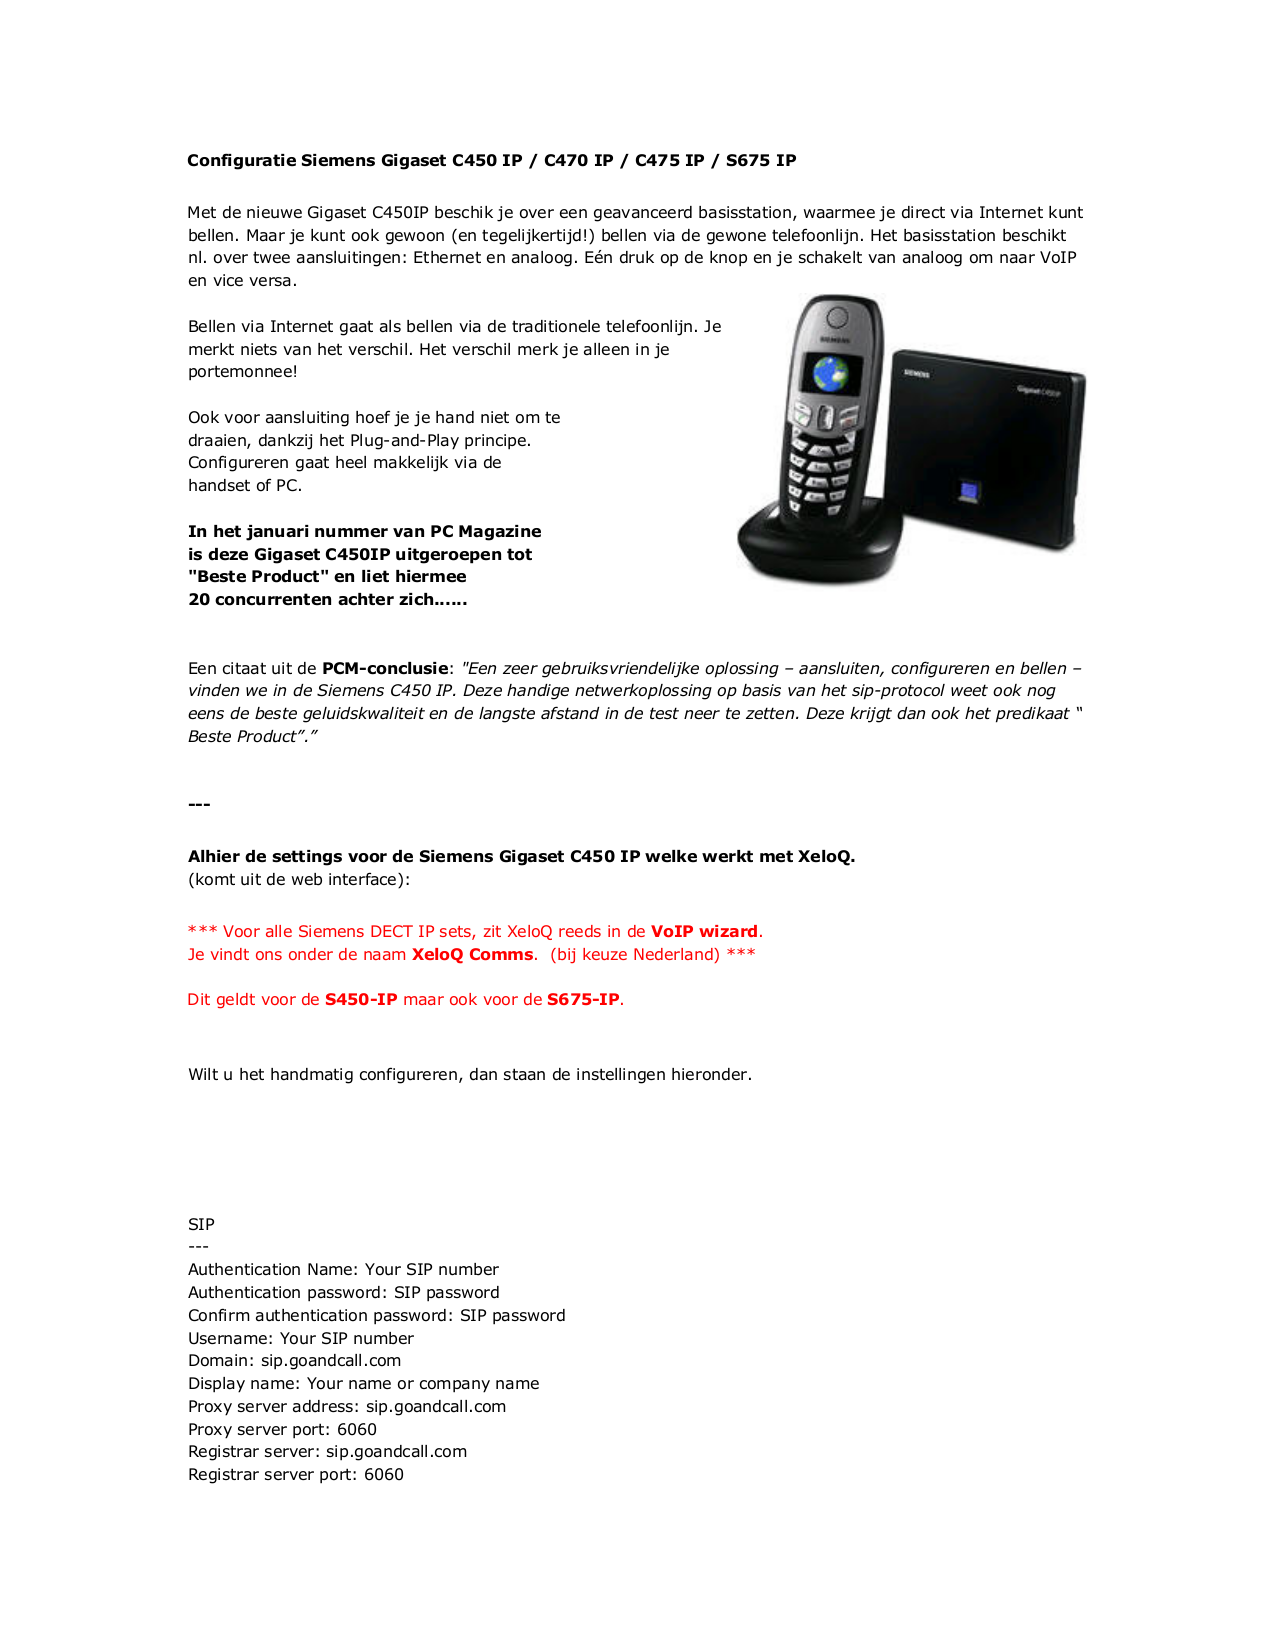 download free pdf for siemens gigaset s675ip telephone manual rh umlib com Siemens Gigaset SE567 Siemens Gigaset SE567